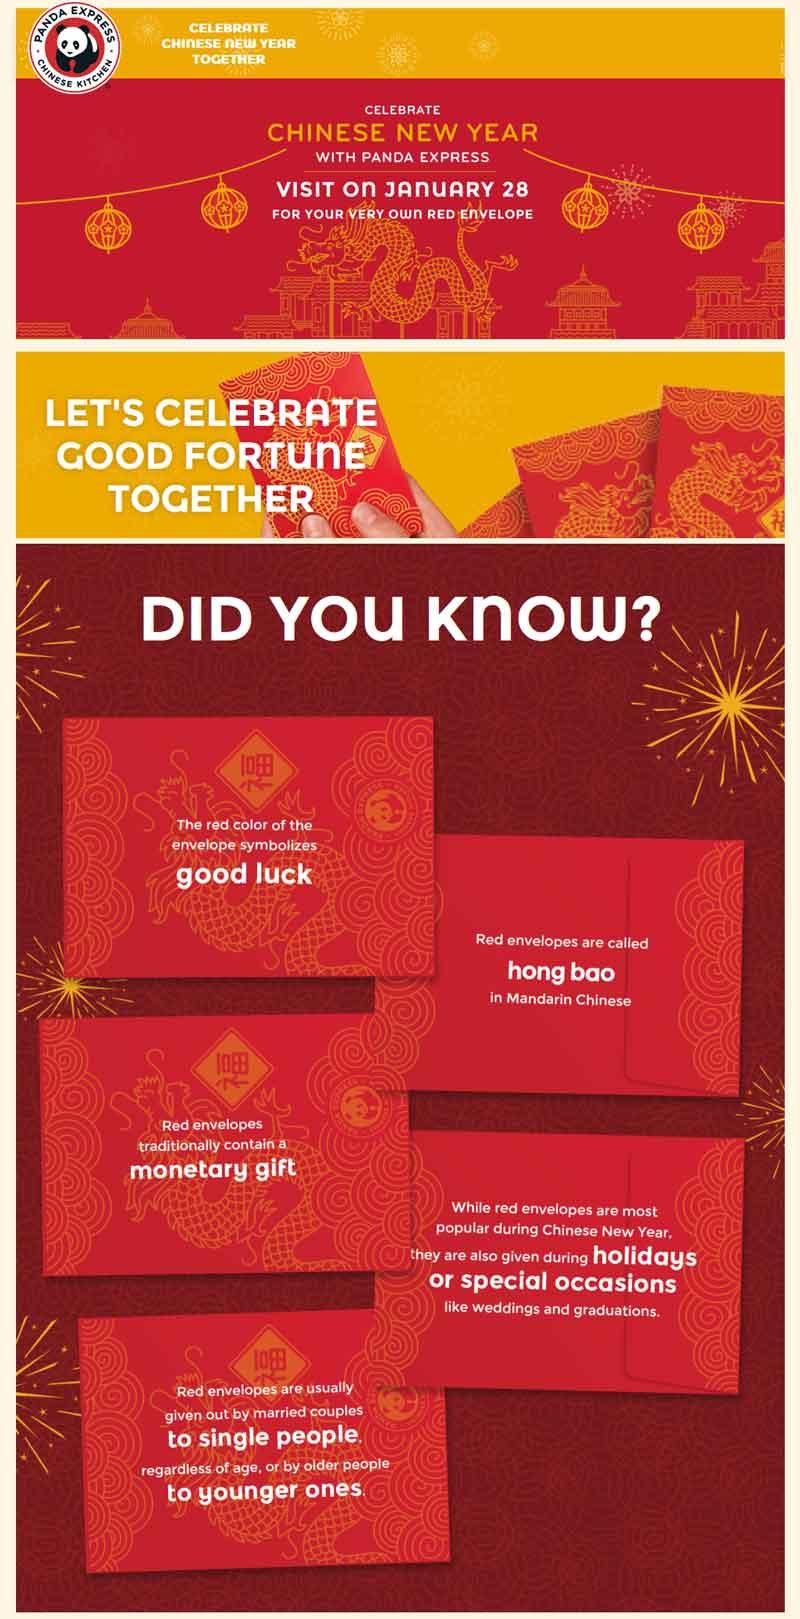 Panda Express Coupon December 2018 Red envelope giveaways Saturday at Panda Express restaurants